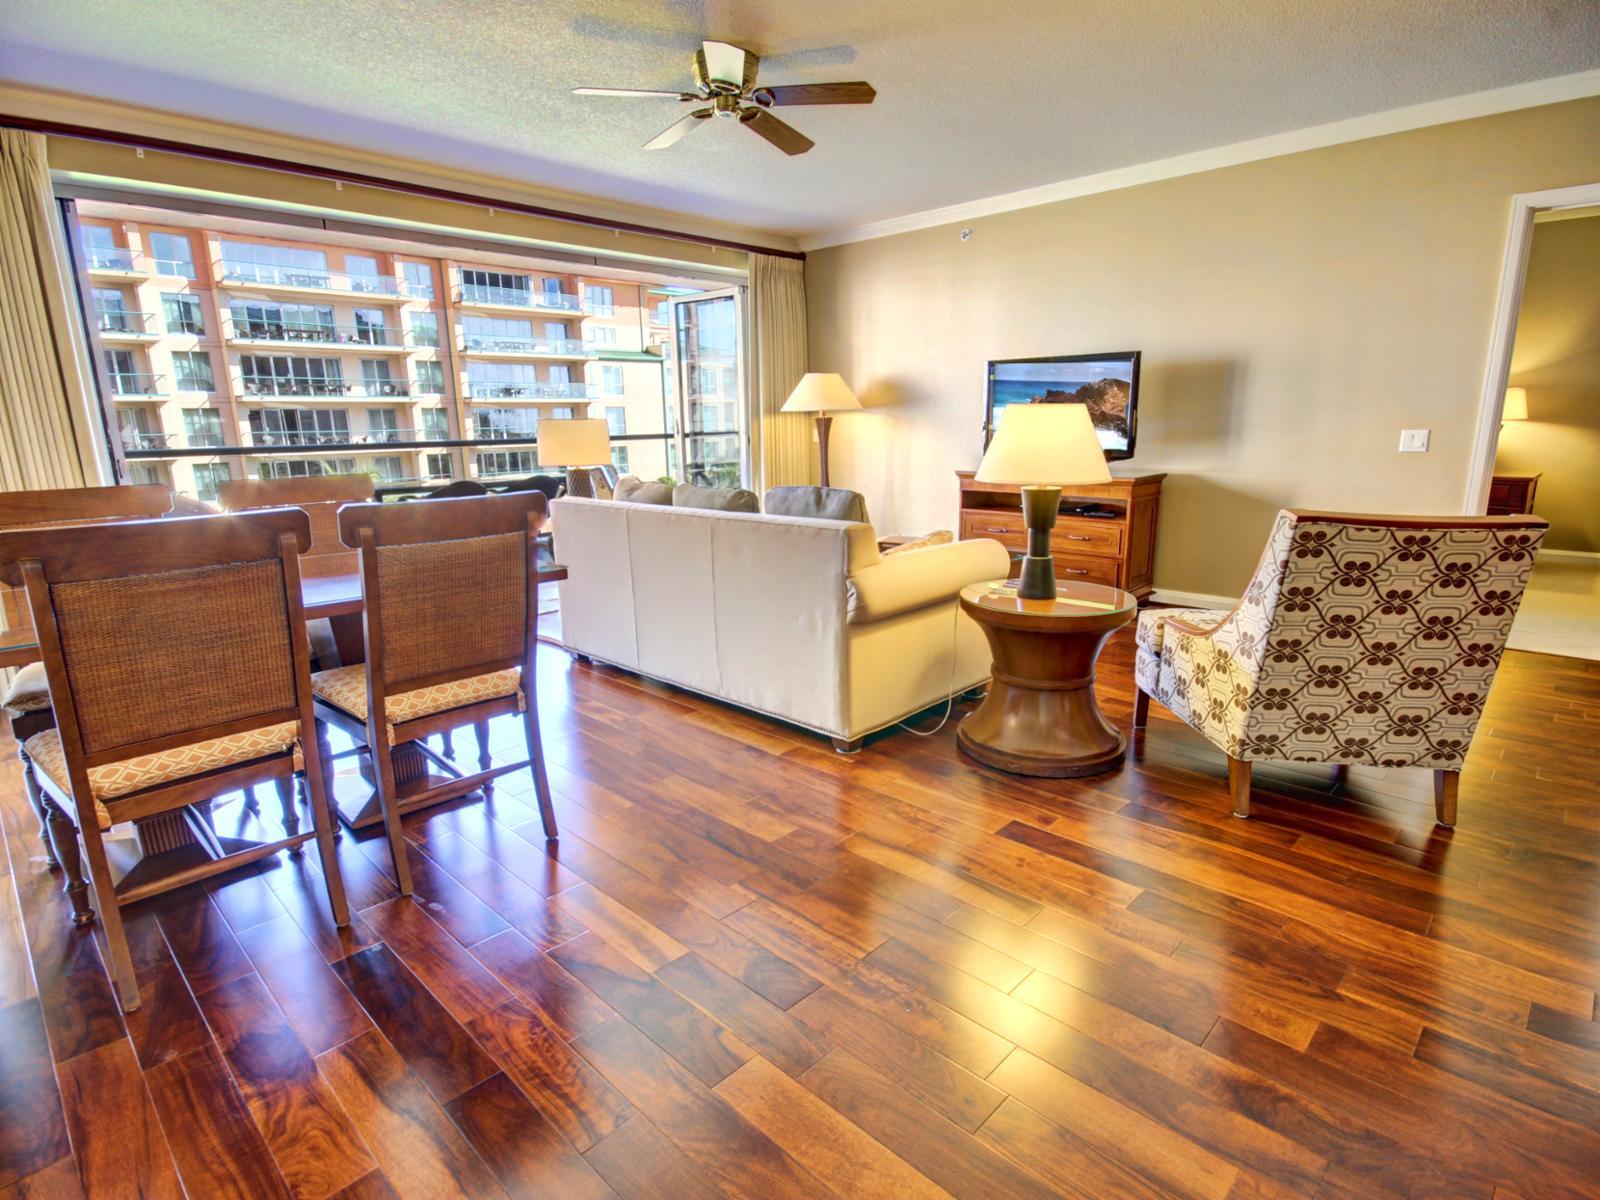 This beautiful 2 bedroom / 2 bath unit has new hardwood floors and a great open floor plan.